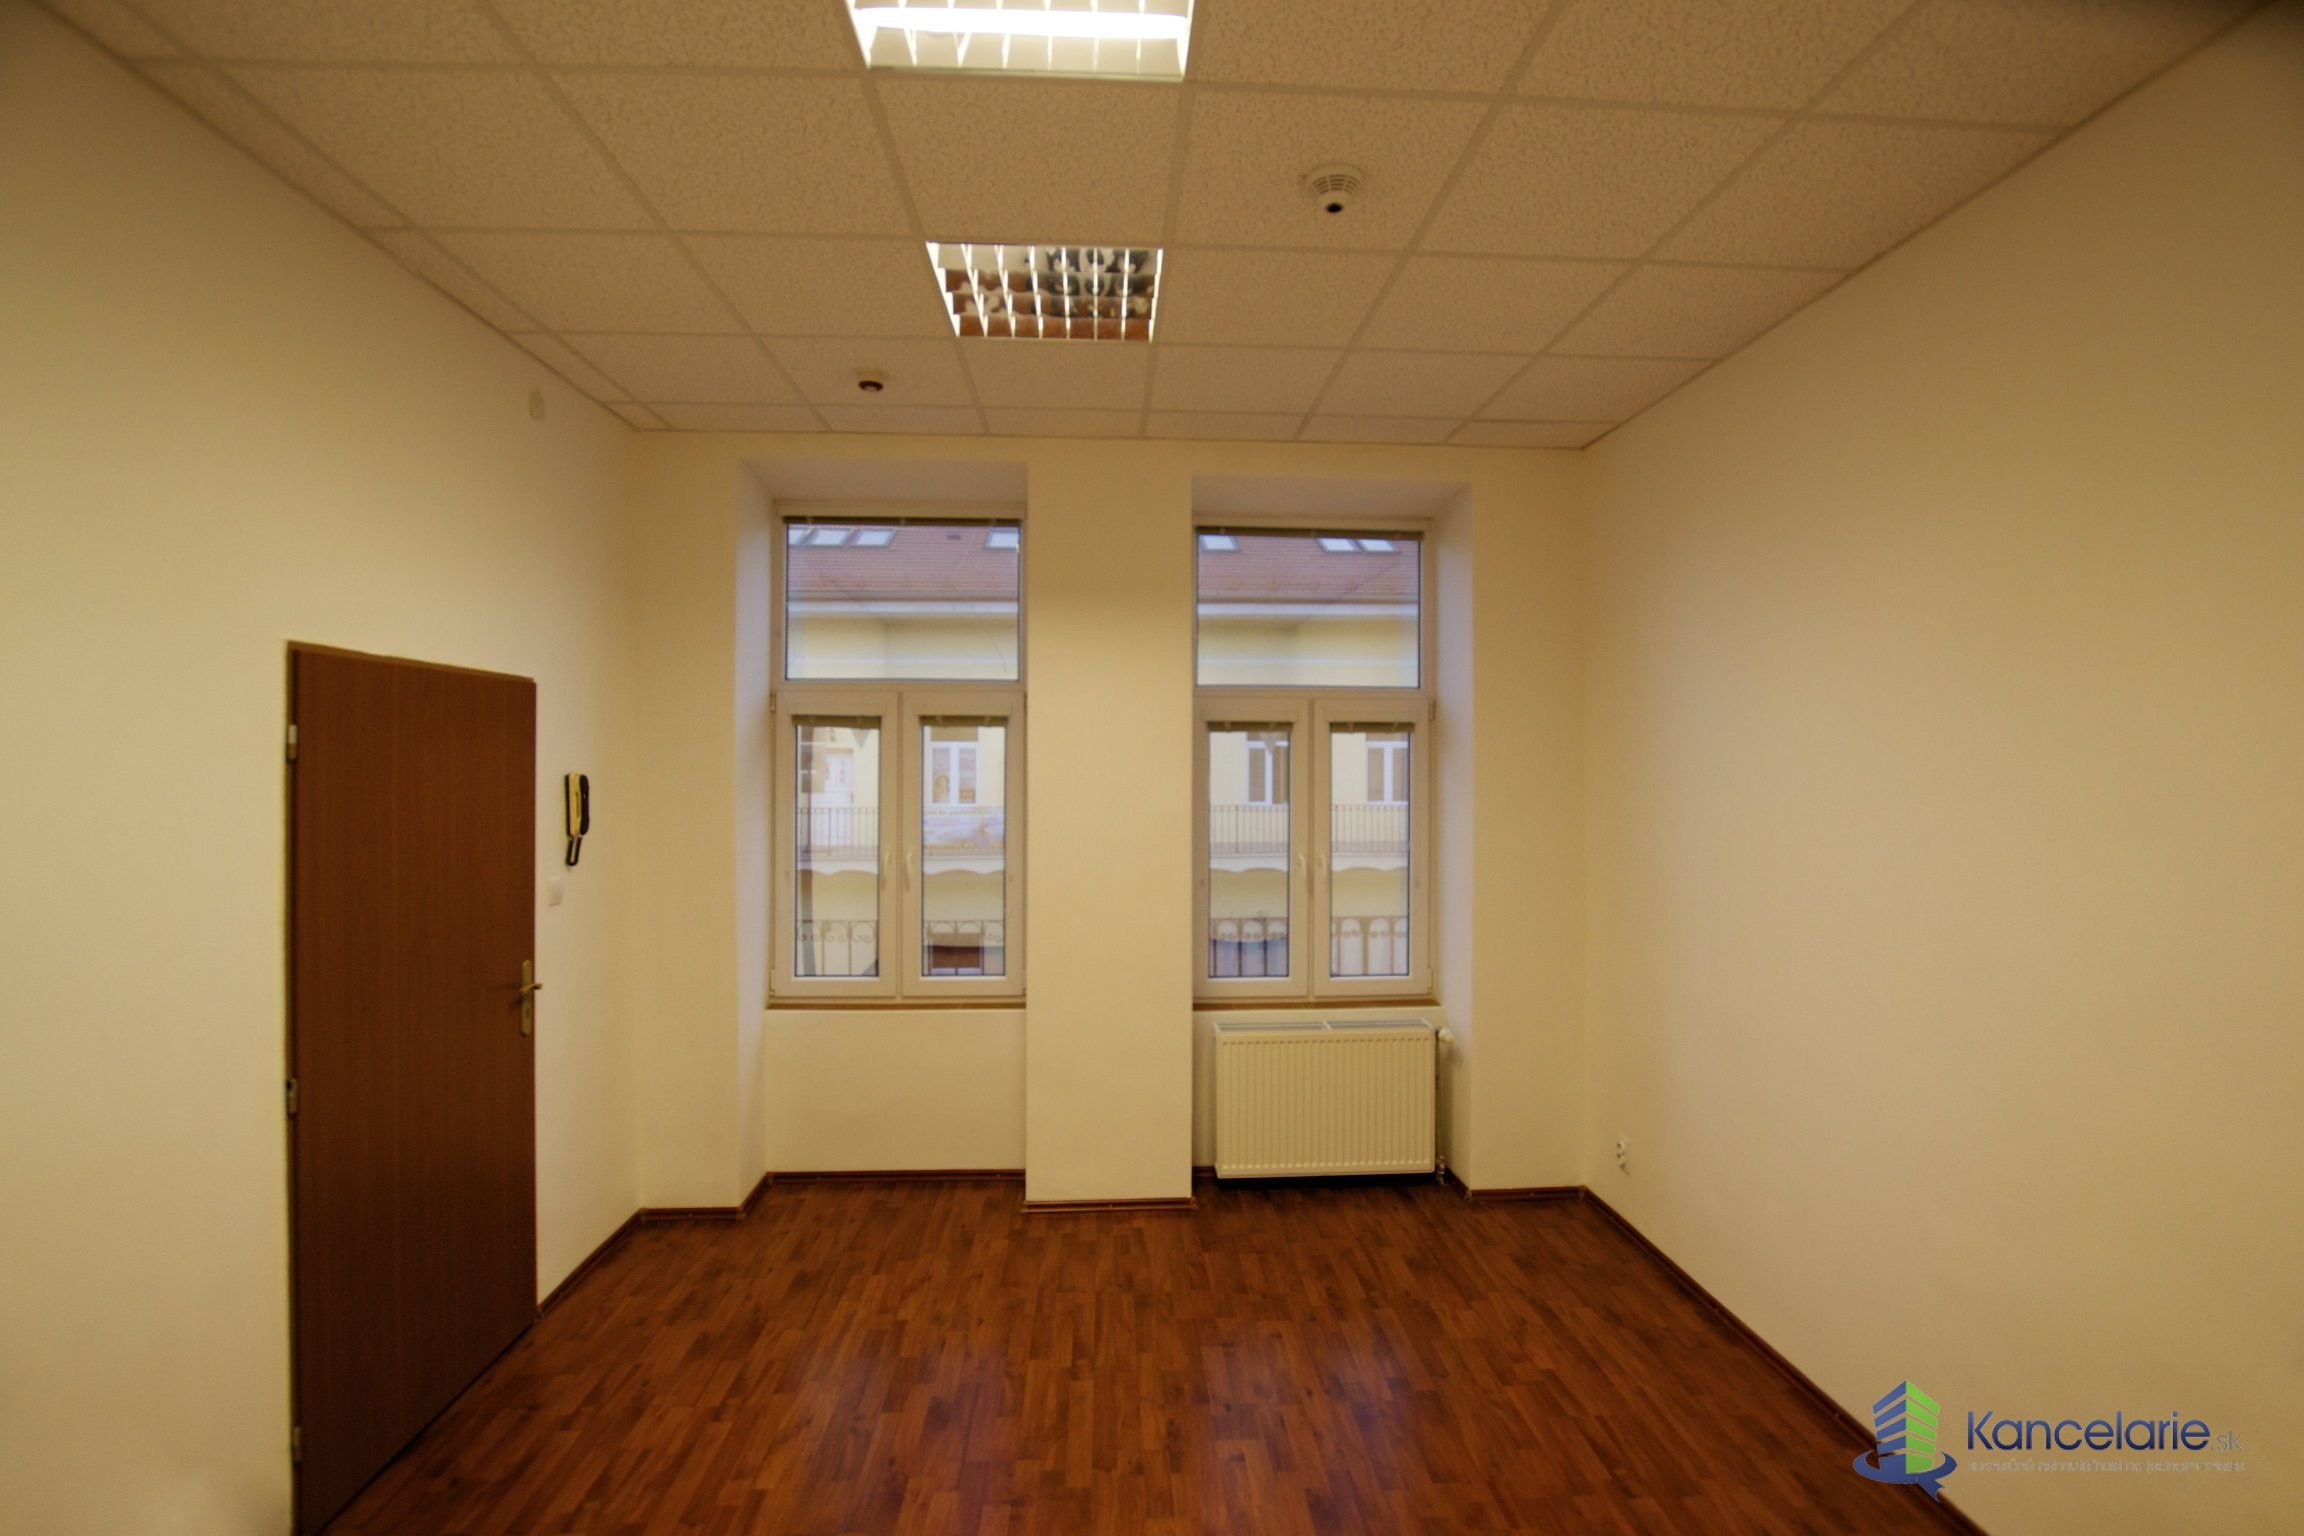 Moyzesova 36, Košice, Moyzesova 36 - 20 m2, Moyzesova 36, Košice